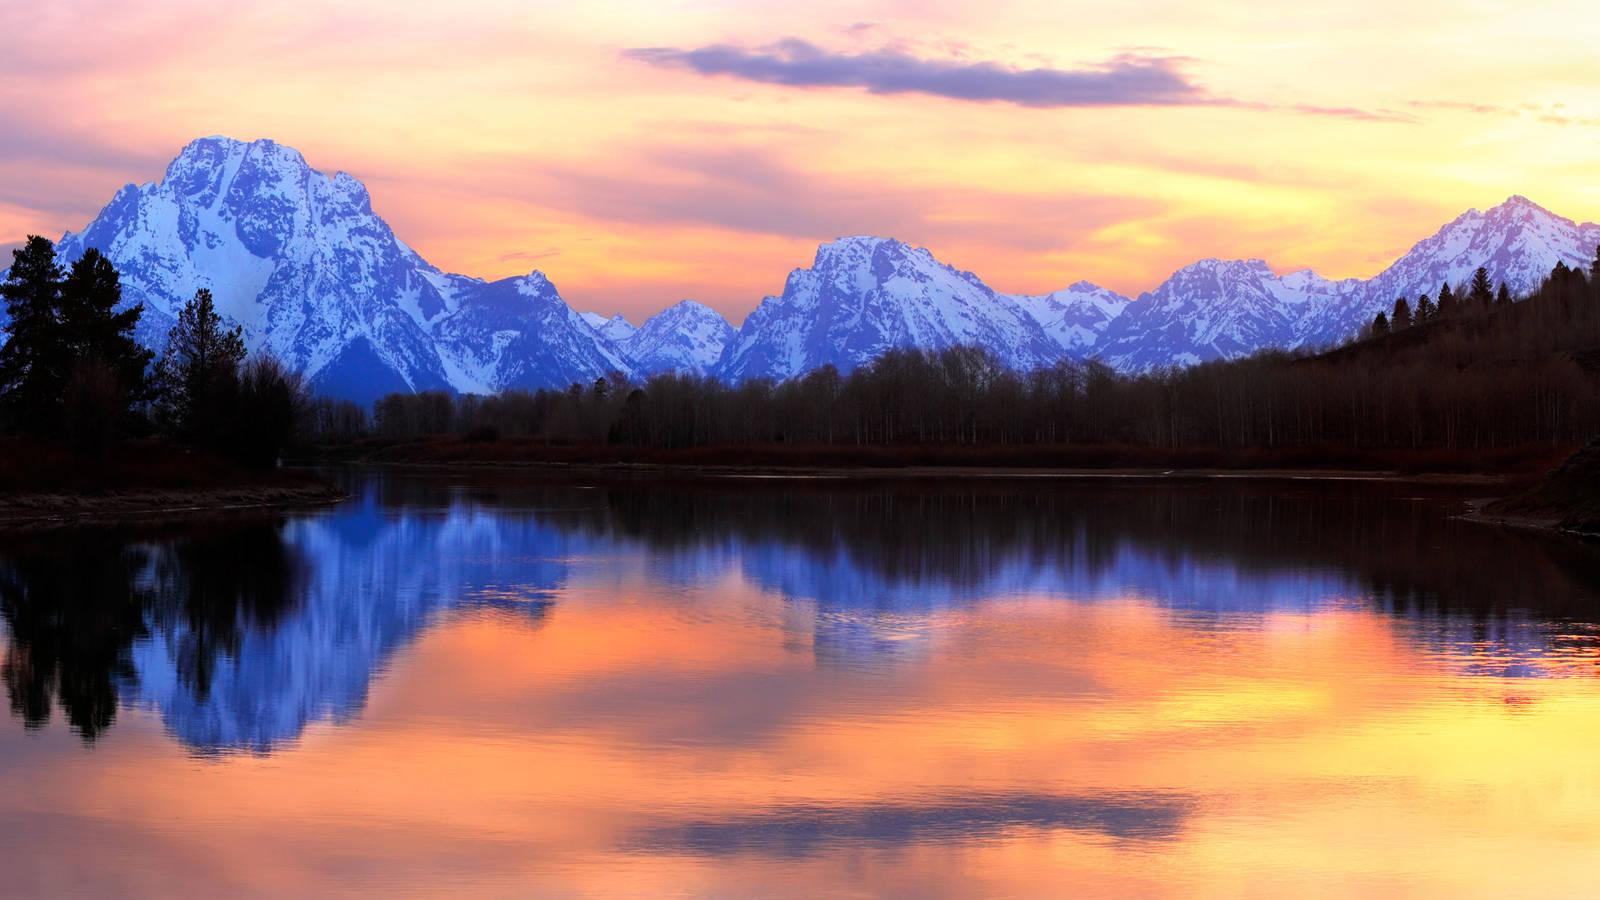 Essence of Yellowstone and Grand Teton